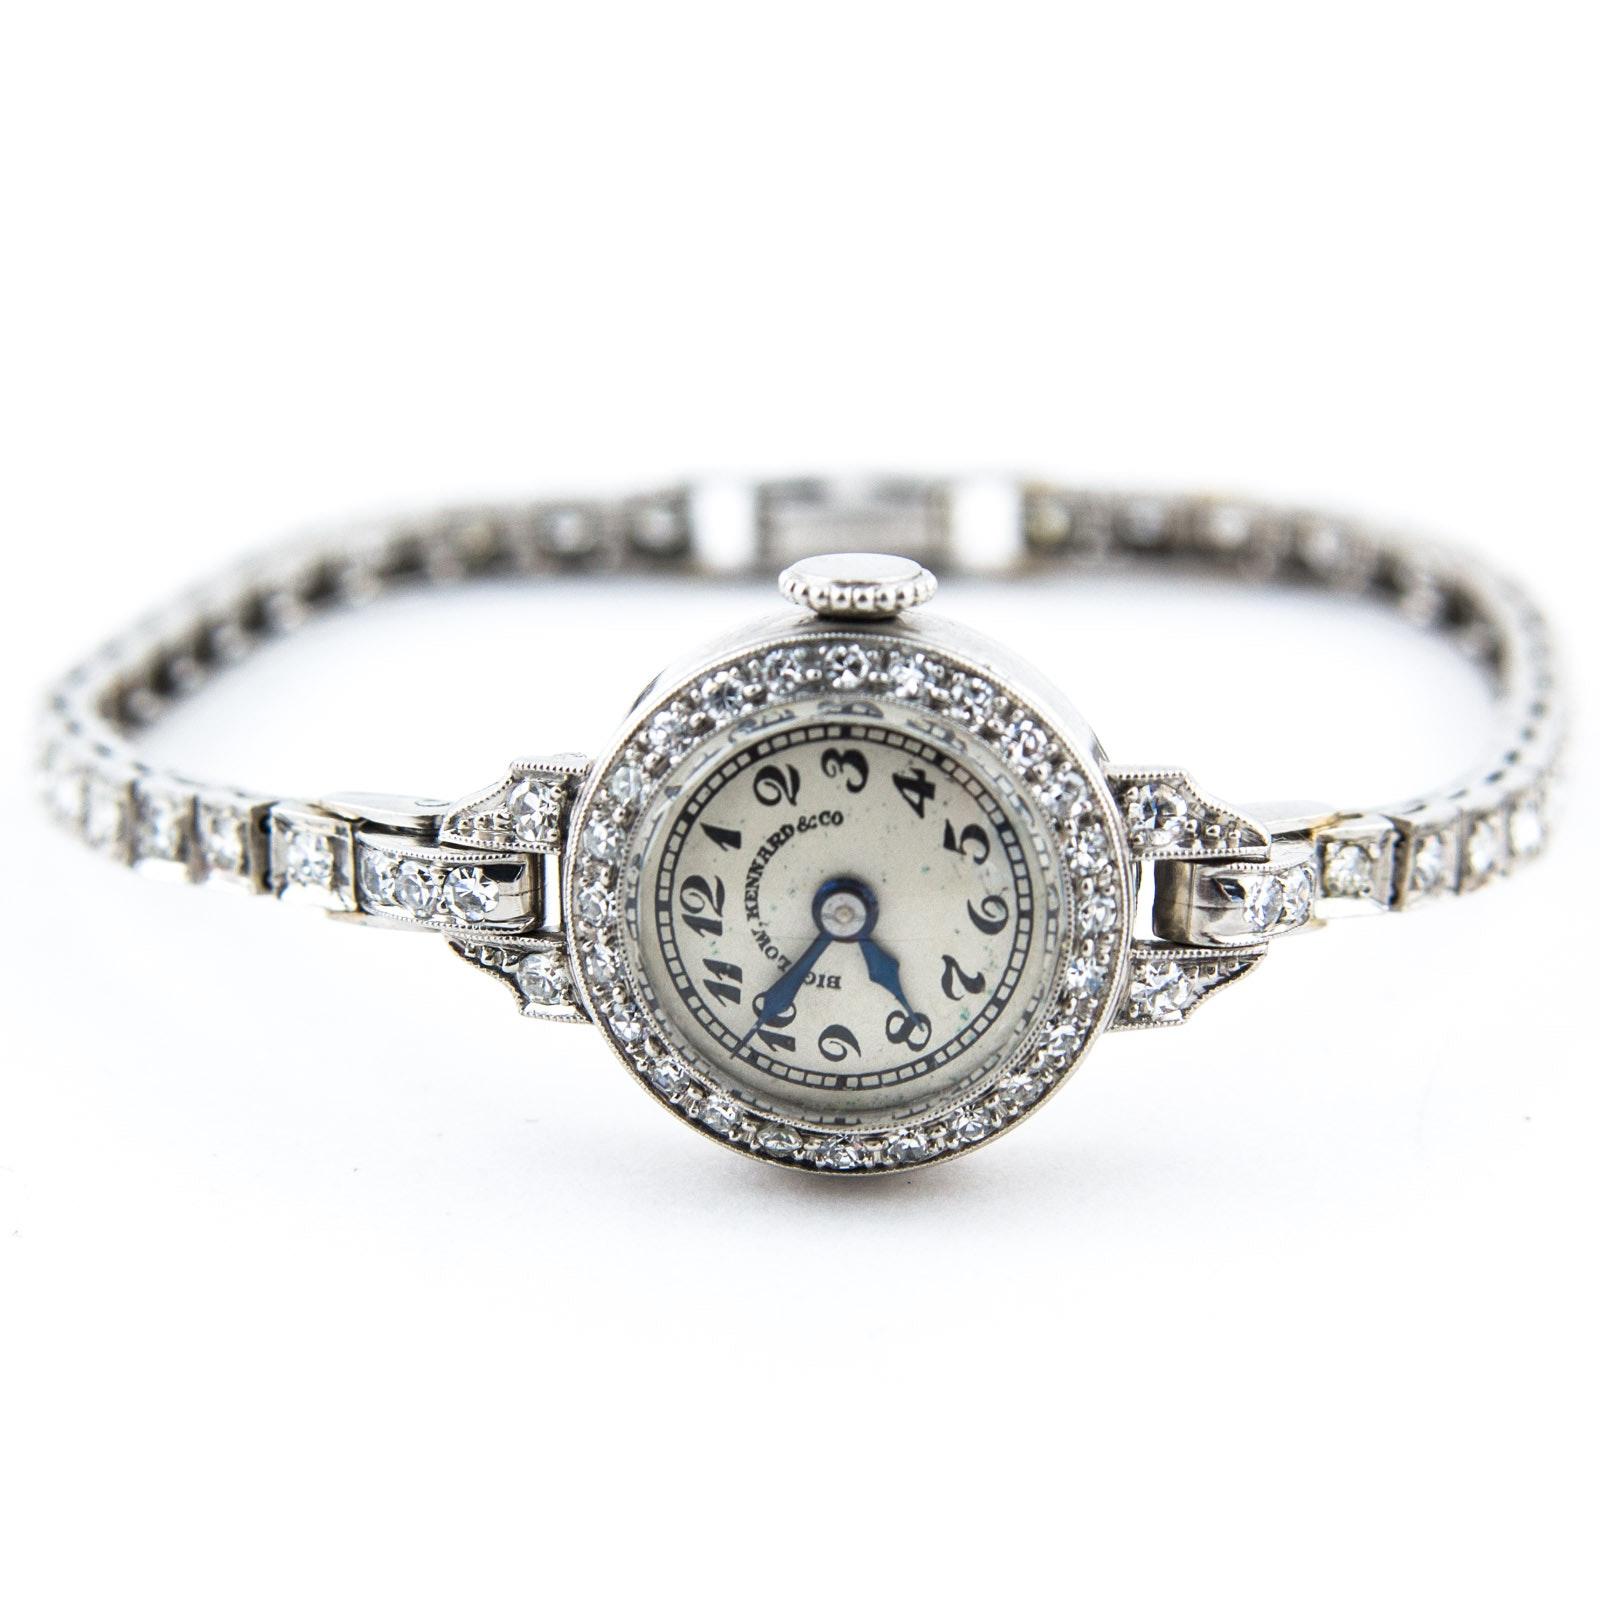 1940s Bigelow, Kennard & Co. Platinum Iridium and Diamond Wristwatch